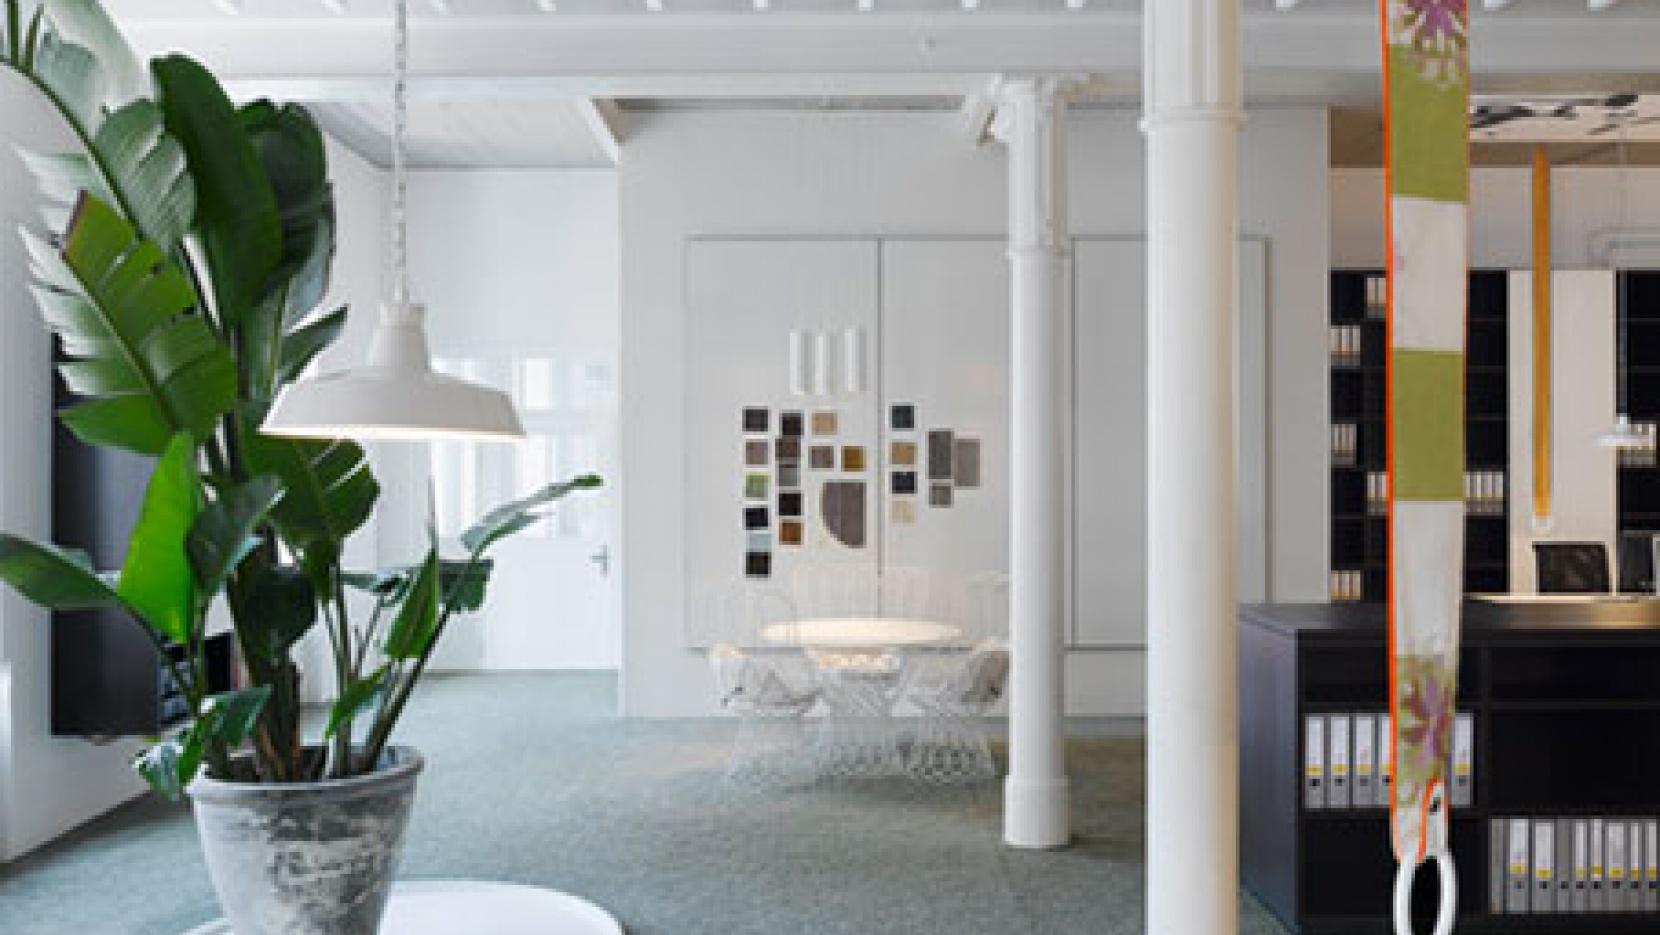 New offices for studio ippolito fleitz group